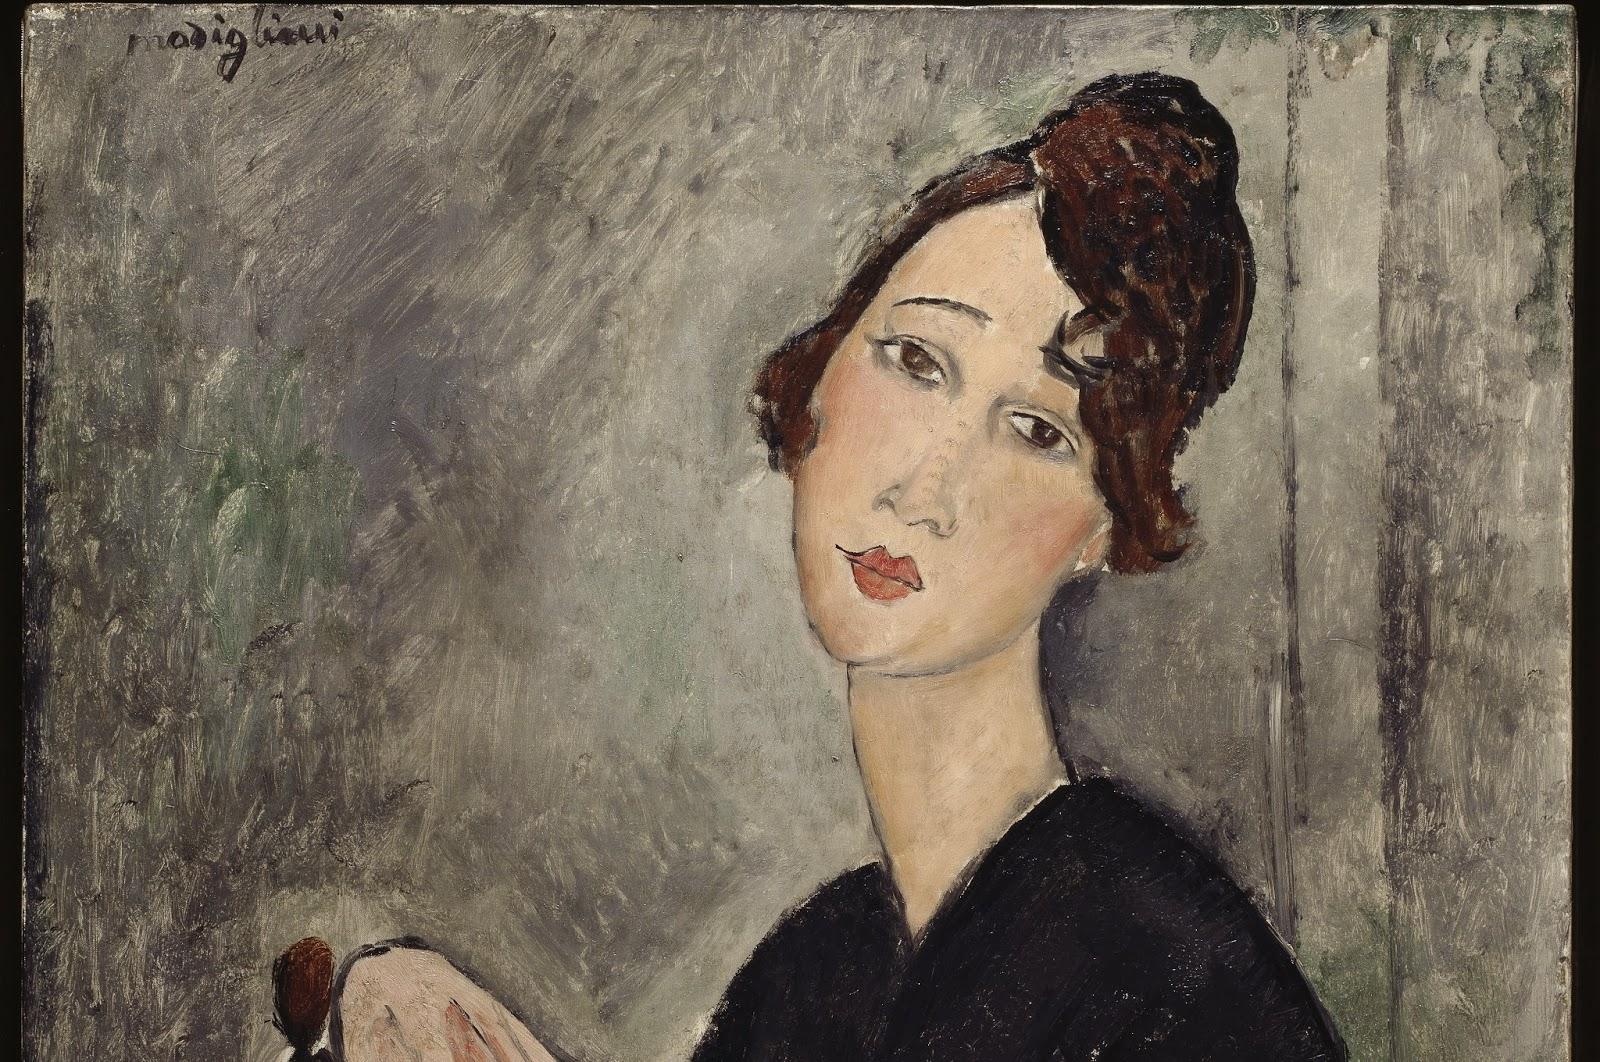 Amedeo Modigliani: Quotes / Aforismi